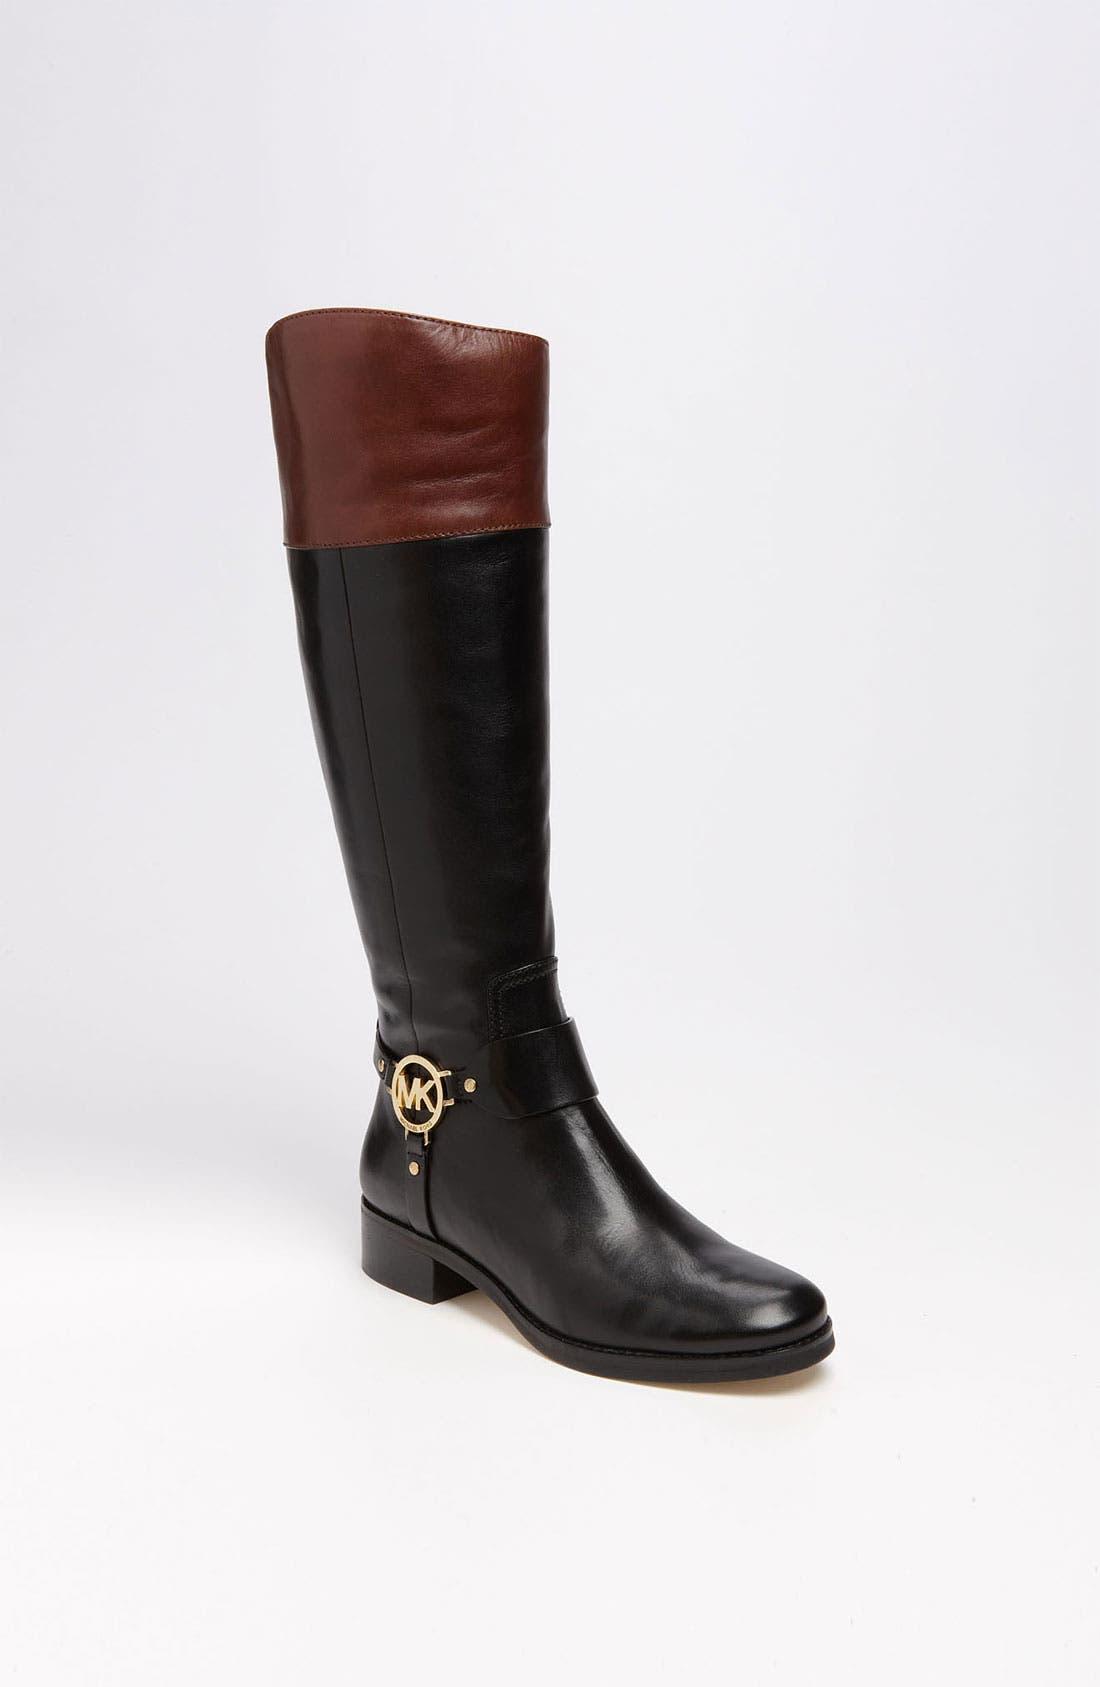 MICHAEL MICHAEL KORS 'Fulton' Harness Boot, Main, color, 014